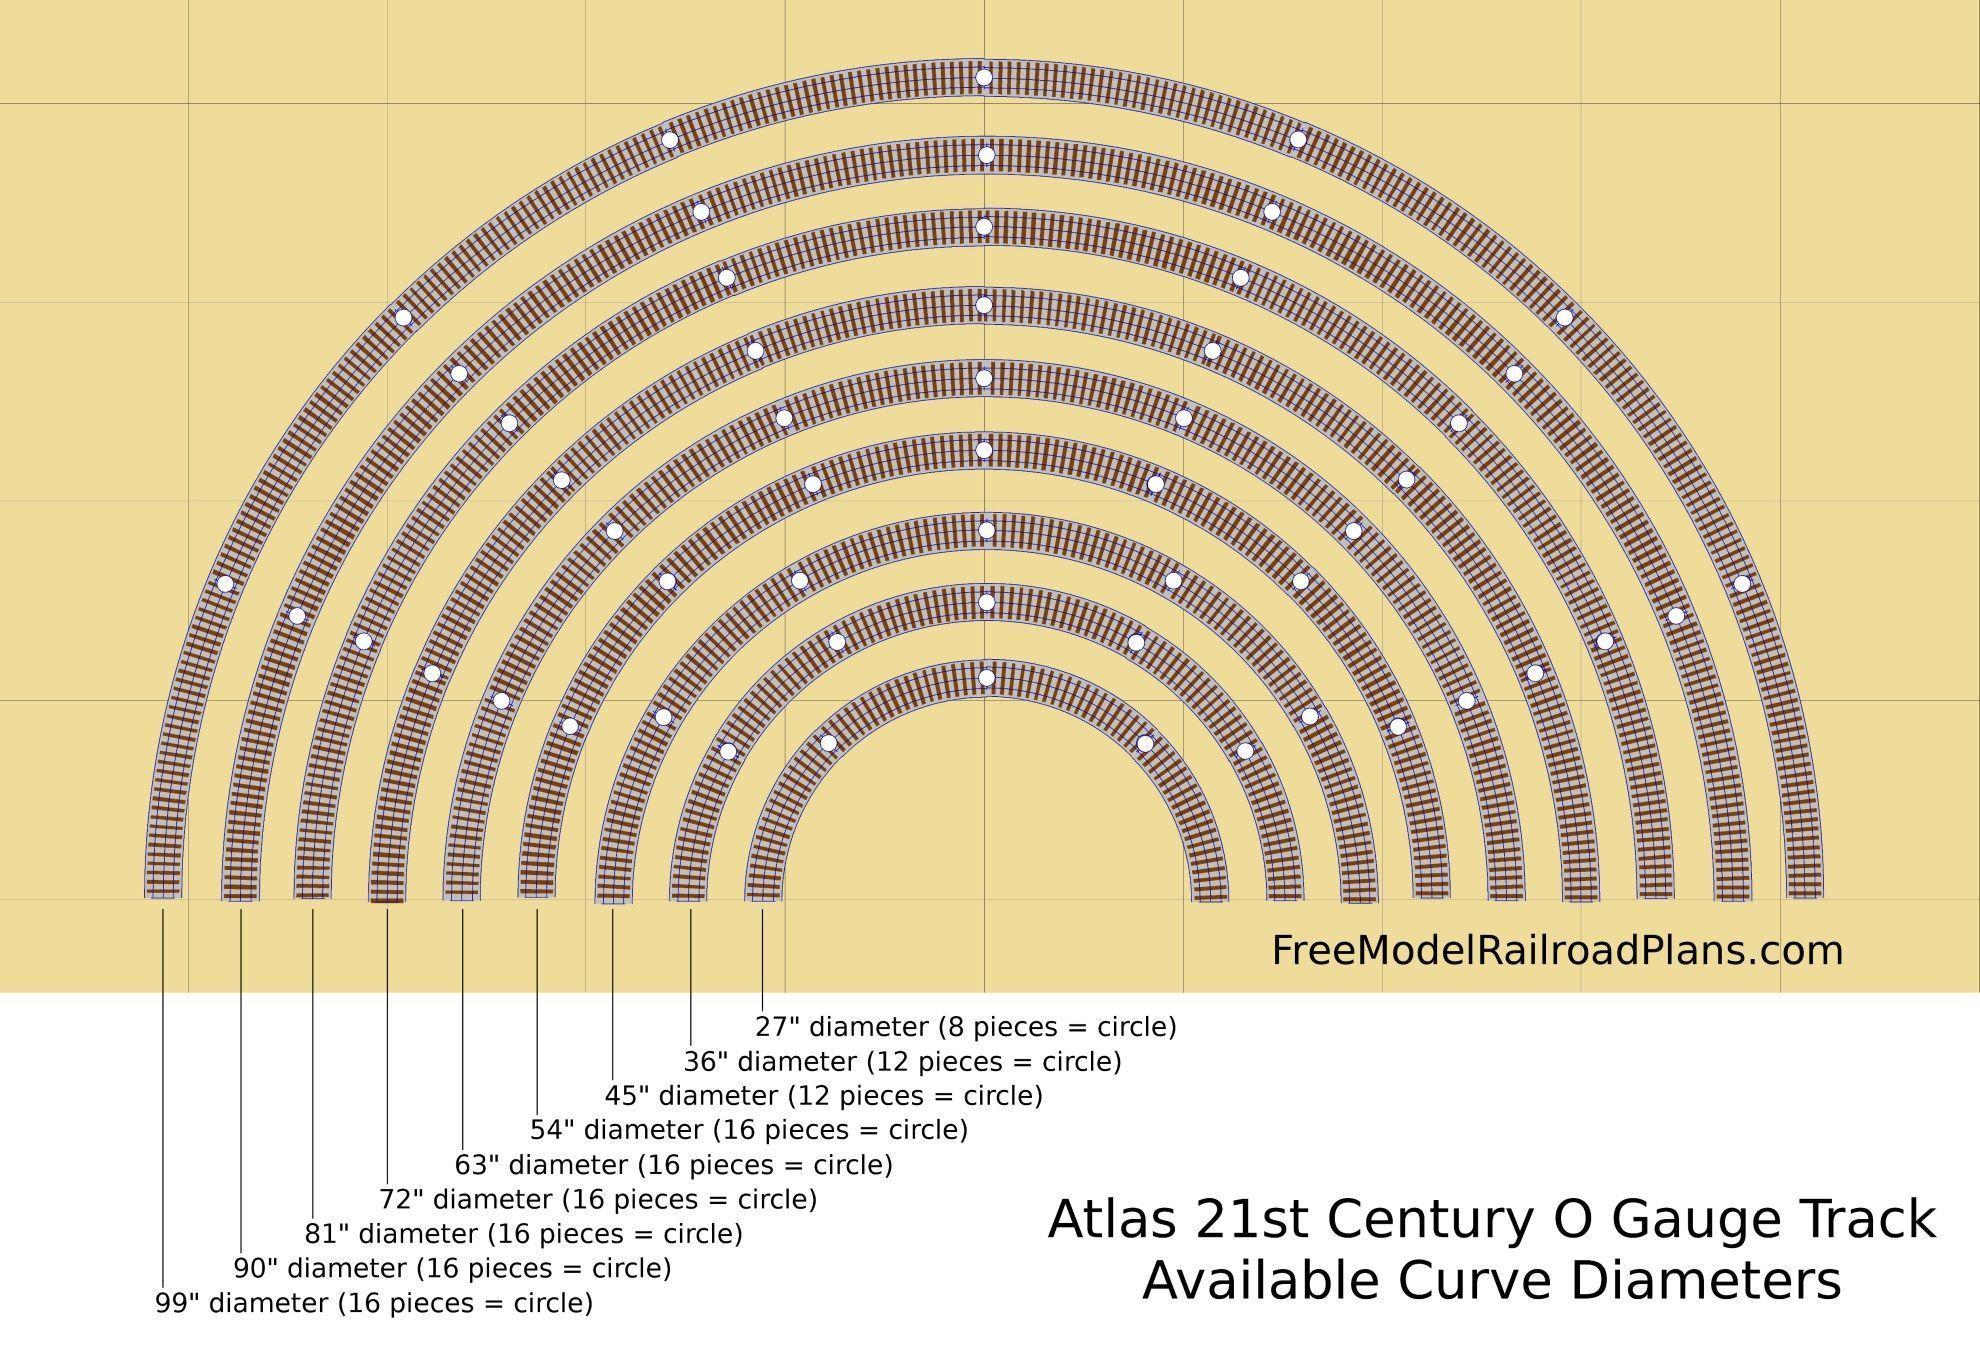 Free, model railroad, layout, plans, Atlas, O gauge, O-27